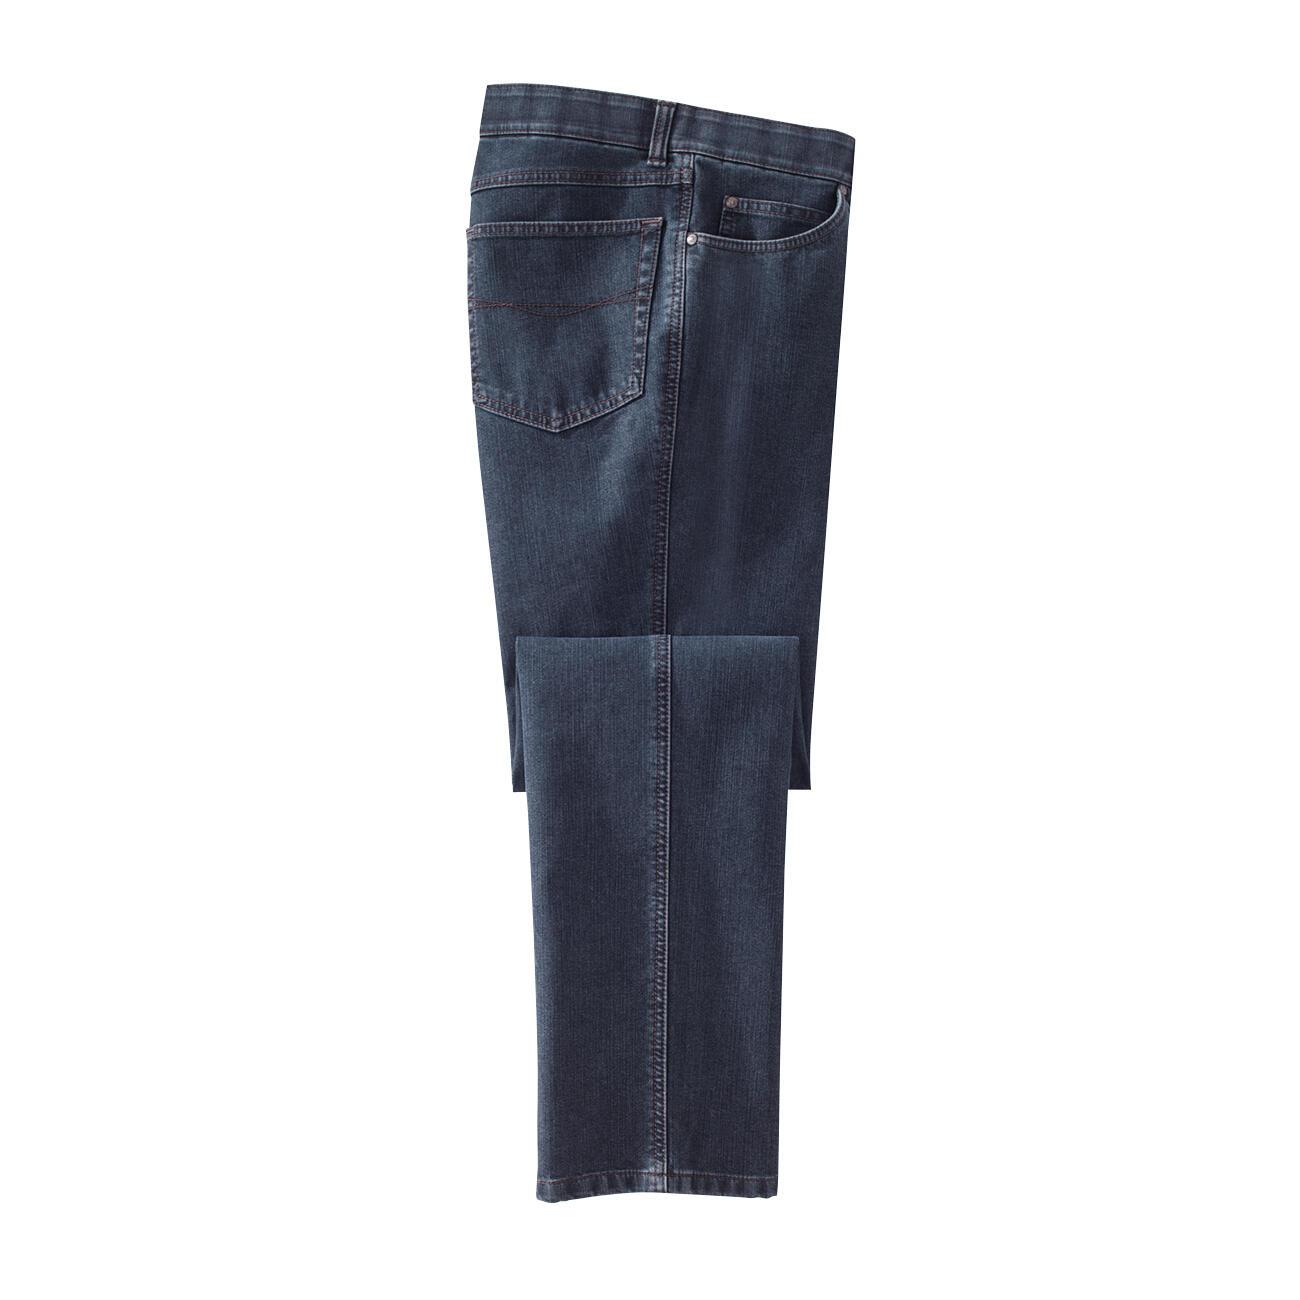 Five Pocket Thermo Jeans | Mode Klassiker entdecken